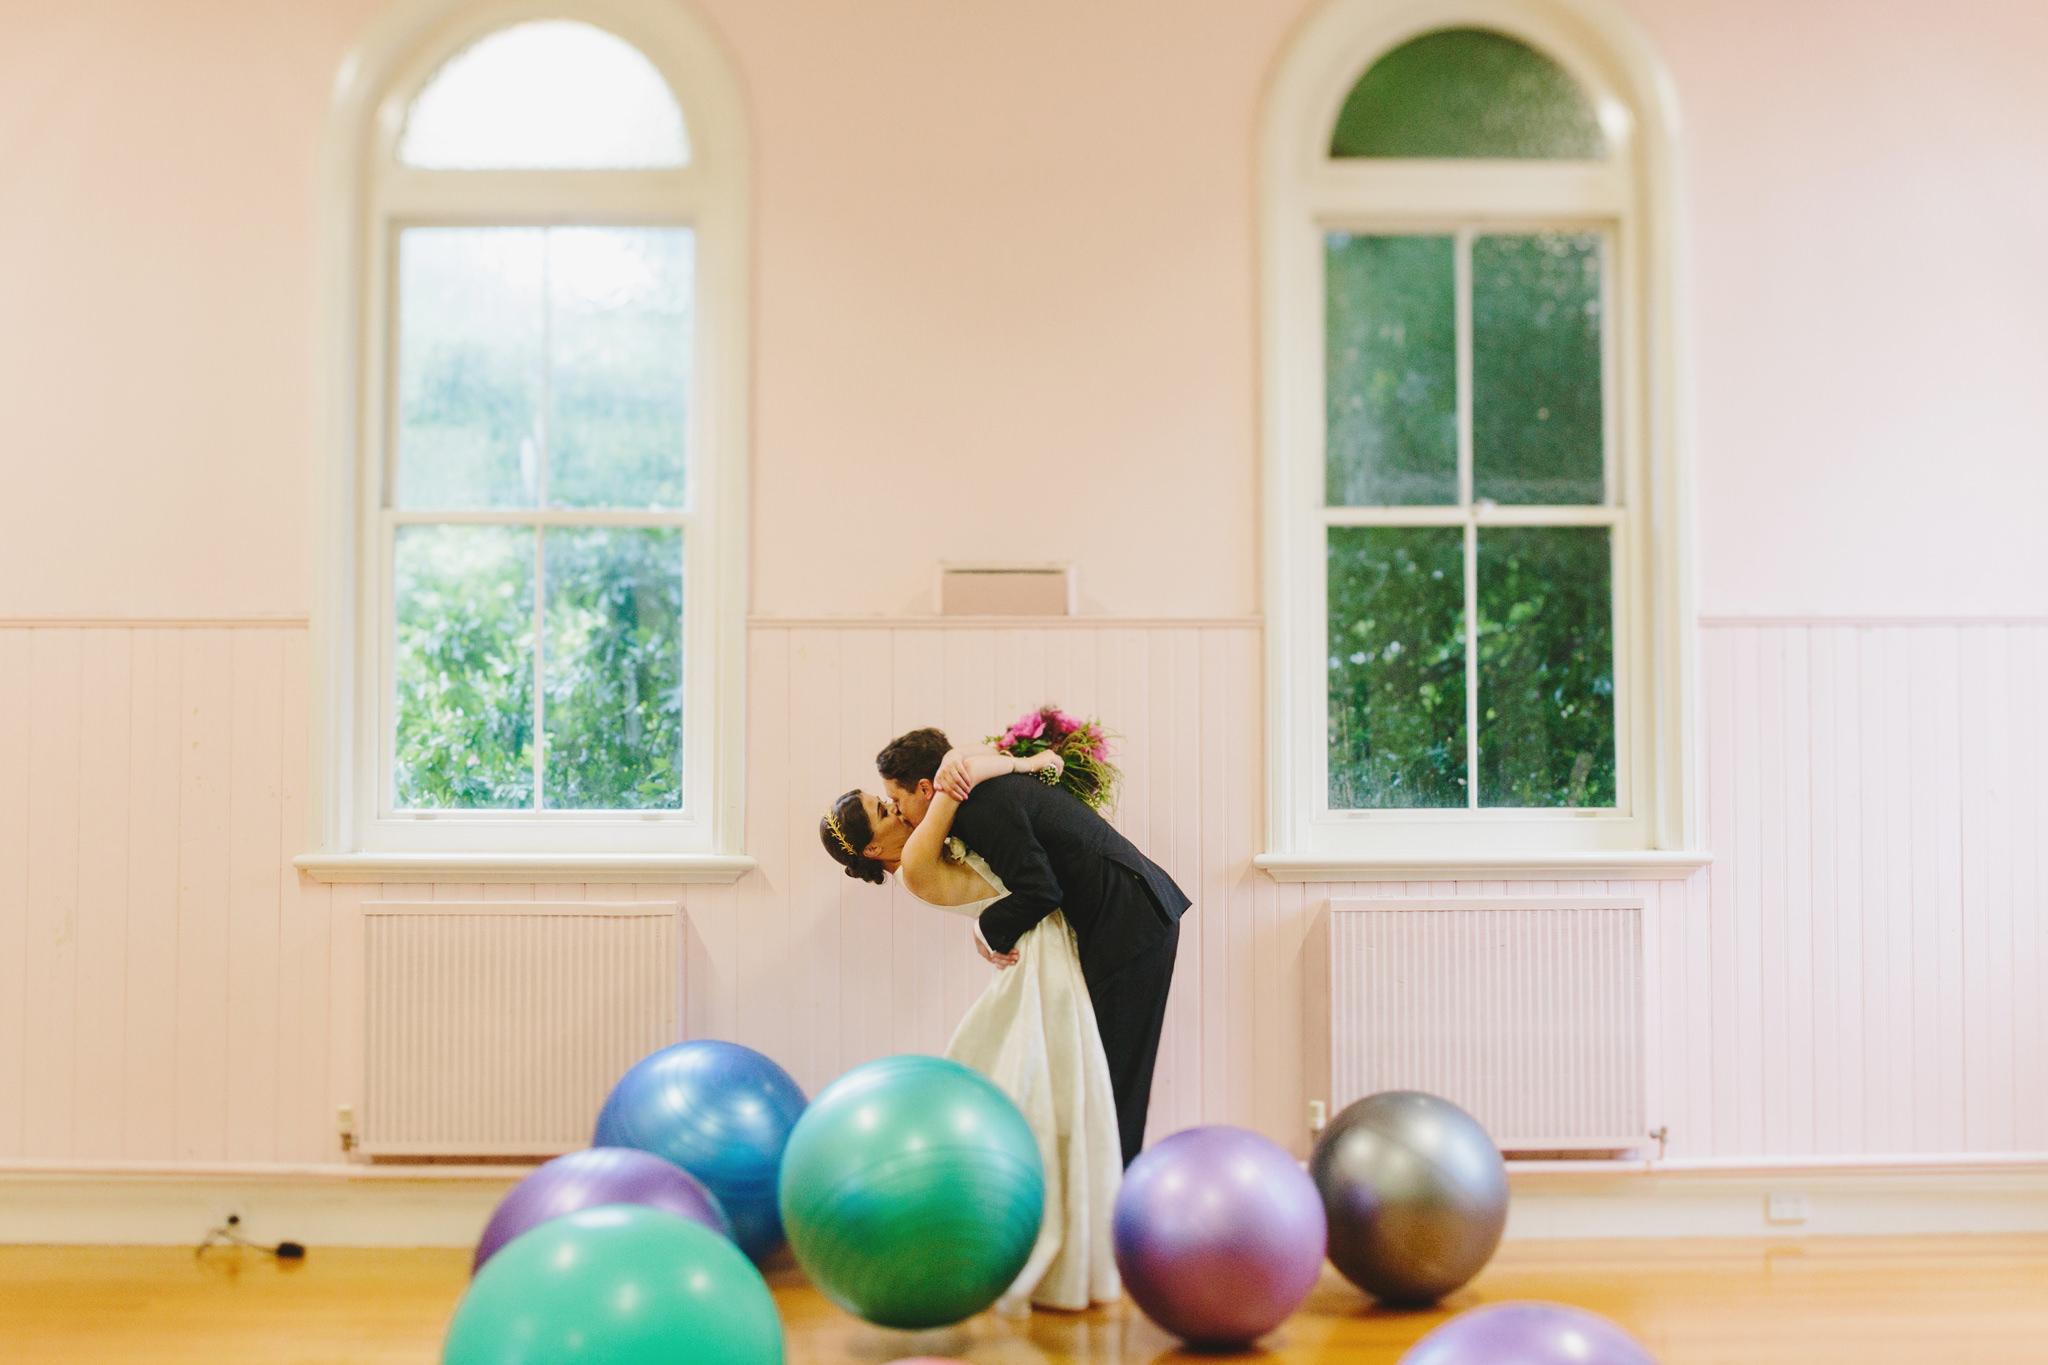 Abbotsford_Convent_Wedding_Peter_Anna087.JPG